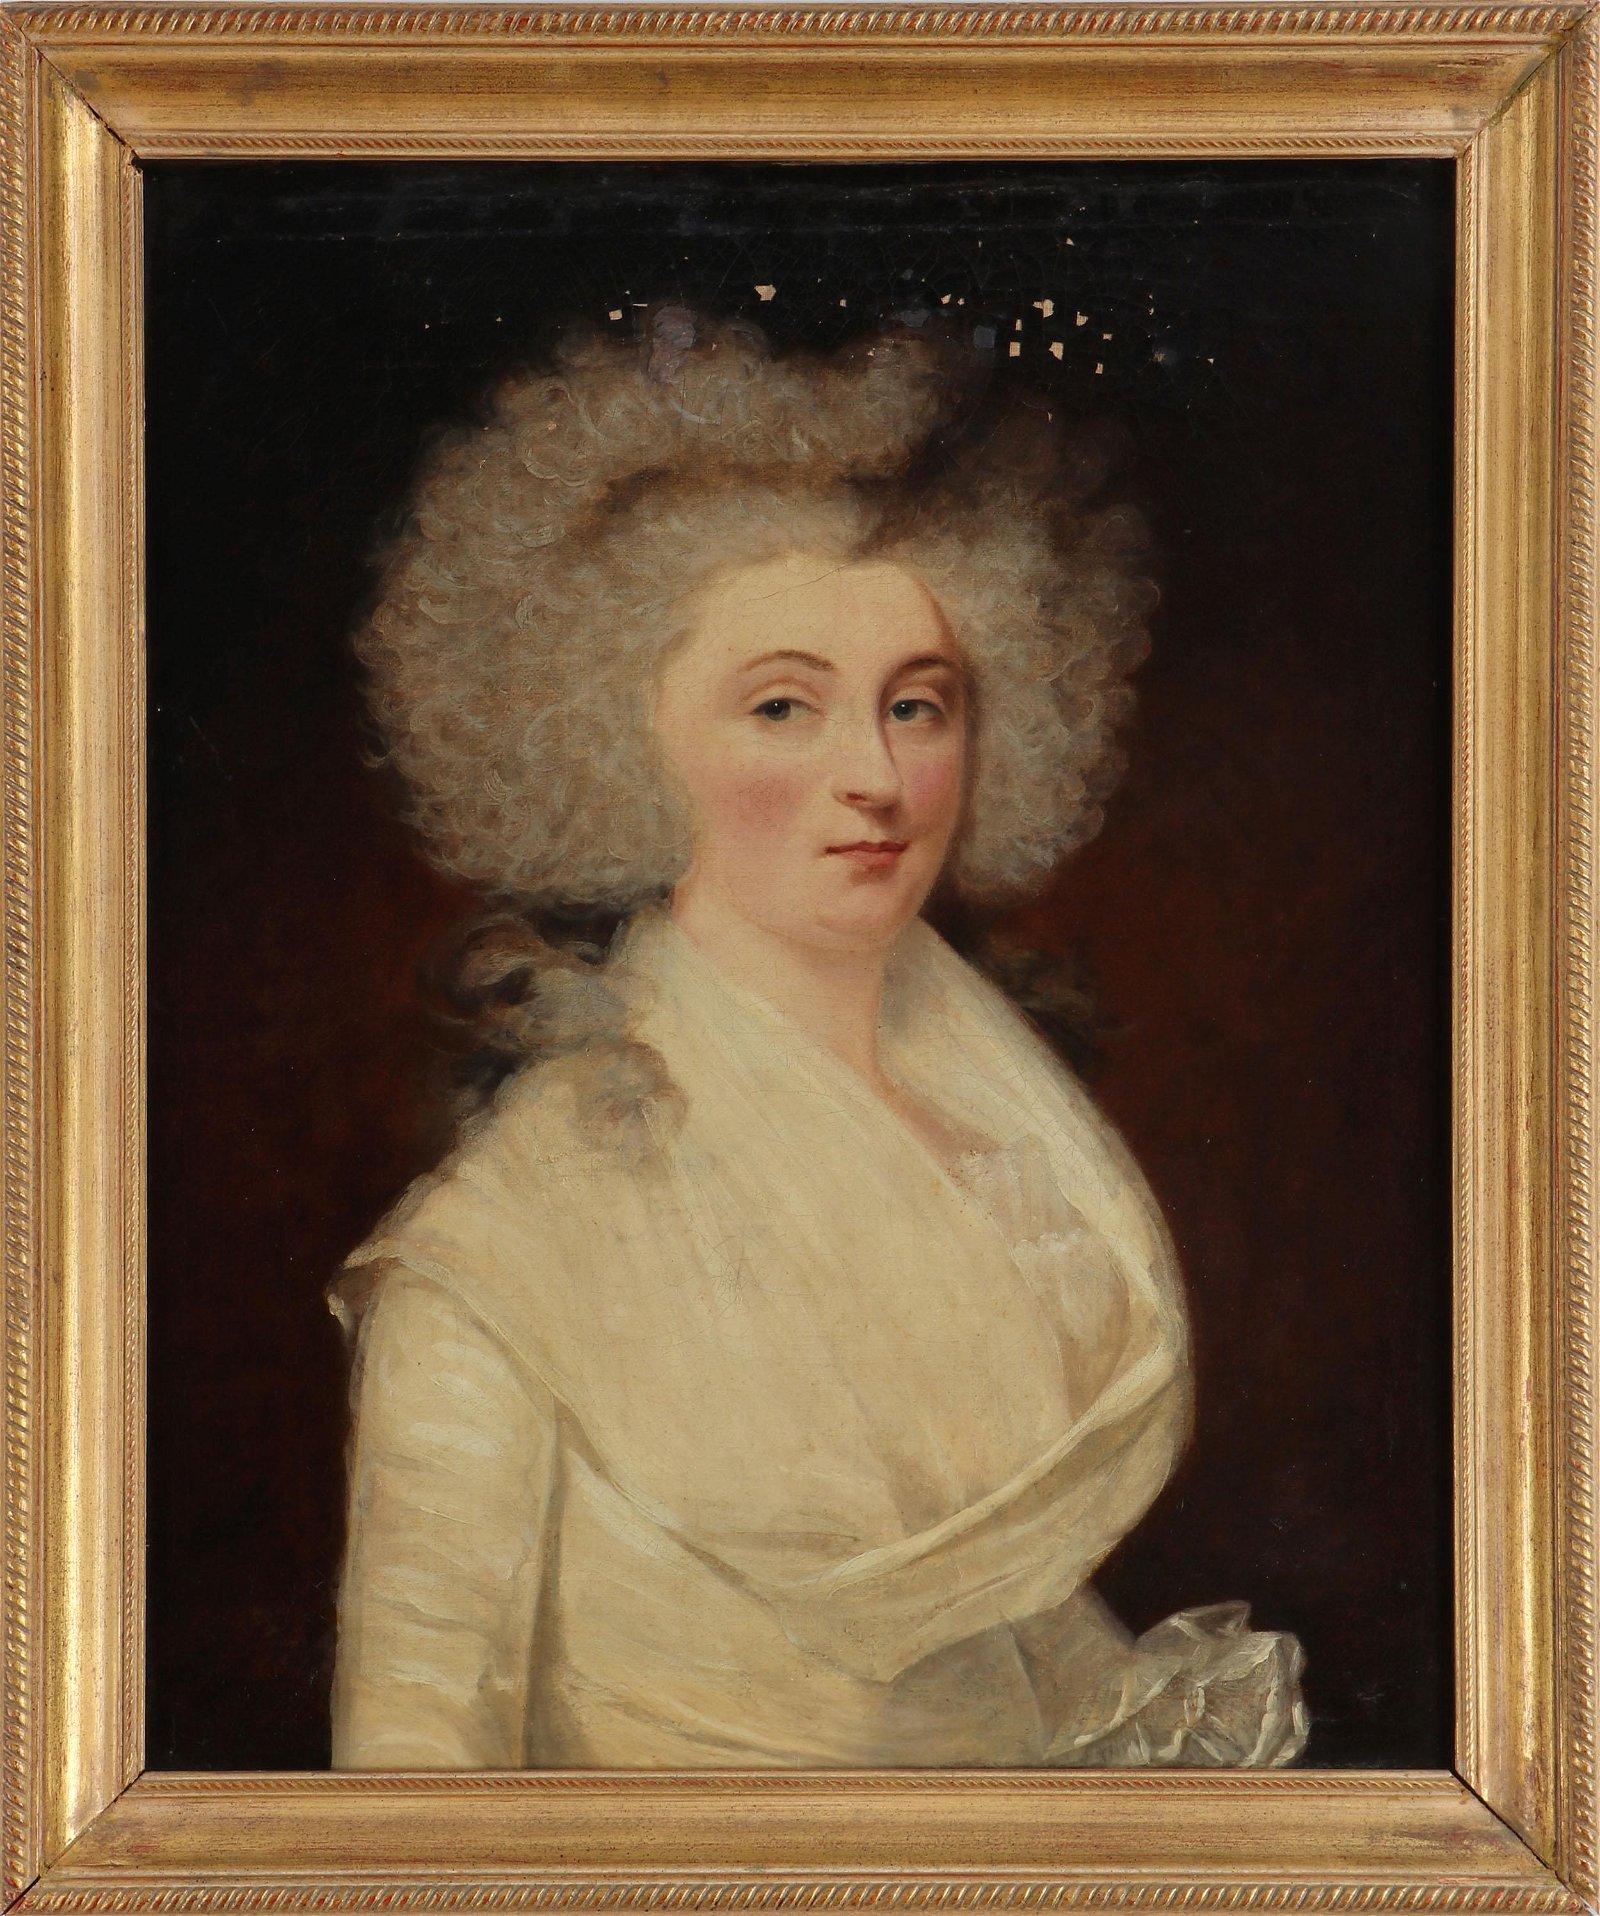 Portrait (Continental School, 18th century)